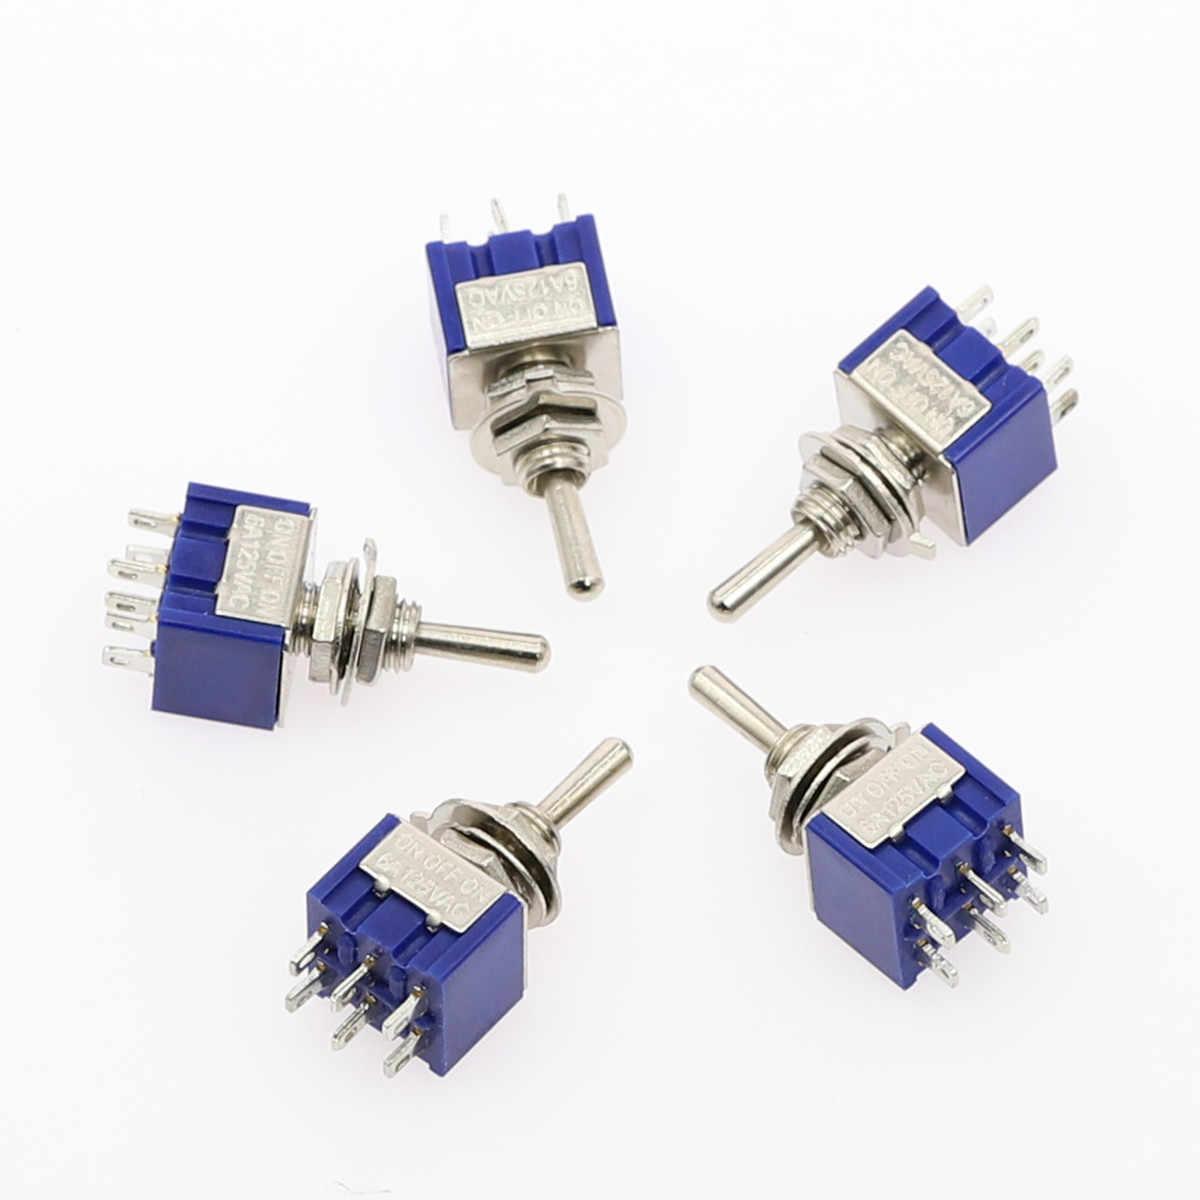 5 Buah Miniatur Toggle Switch Single Double Throw-OFF-On/ON-On 120VAC 6A 1/4 Inci Pemasangan MTS-102 103 202 203